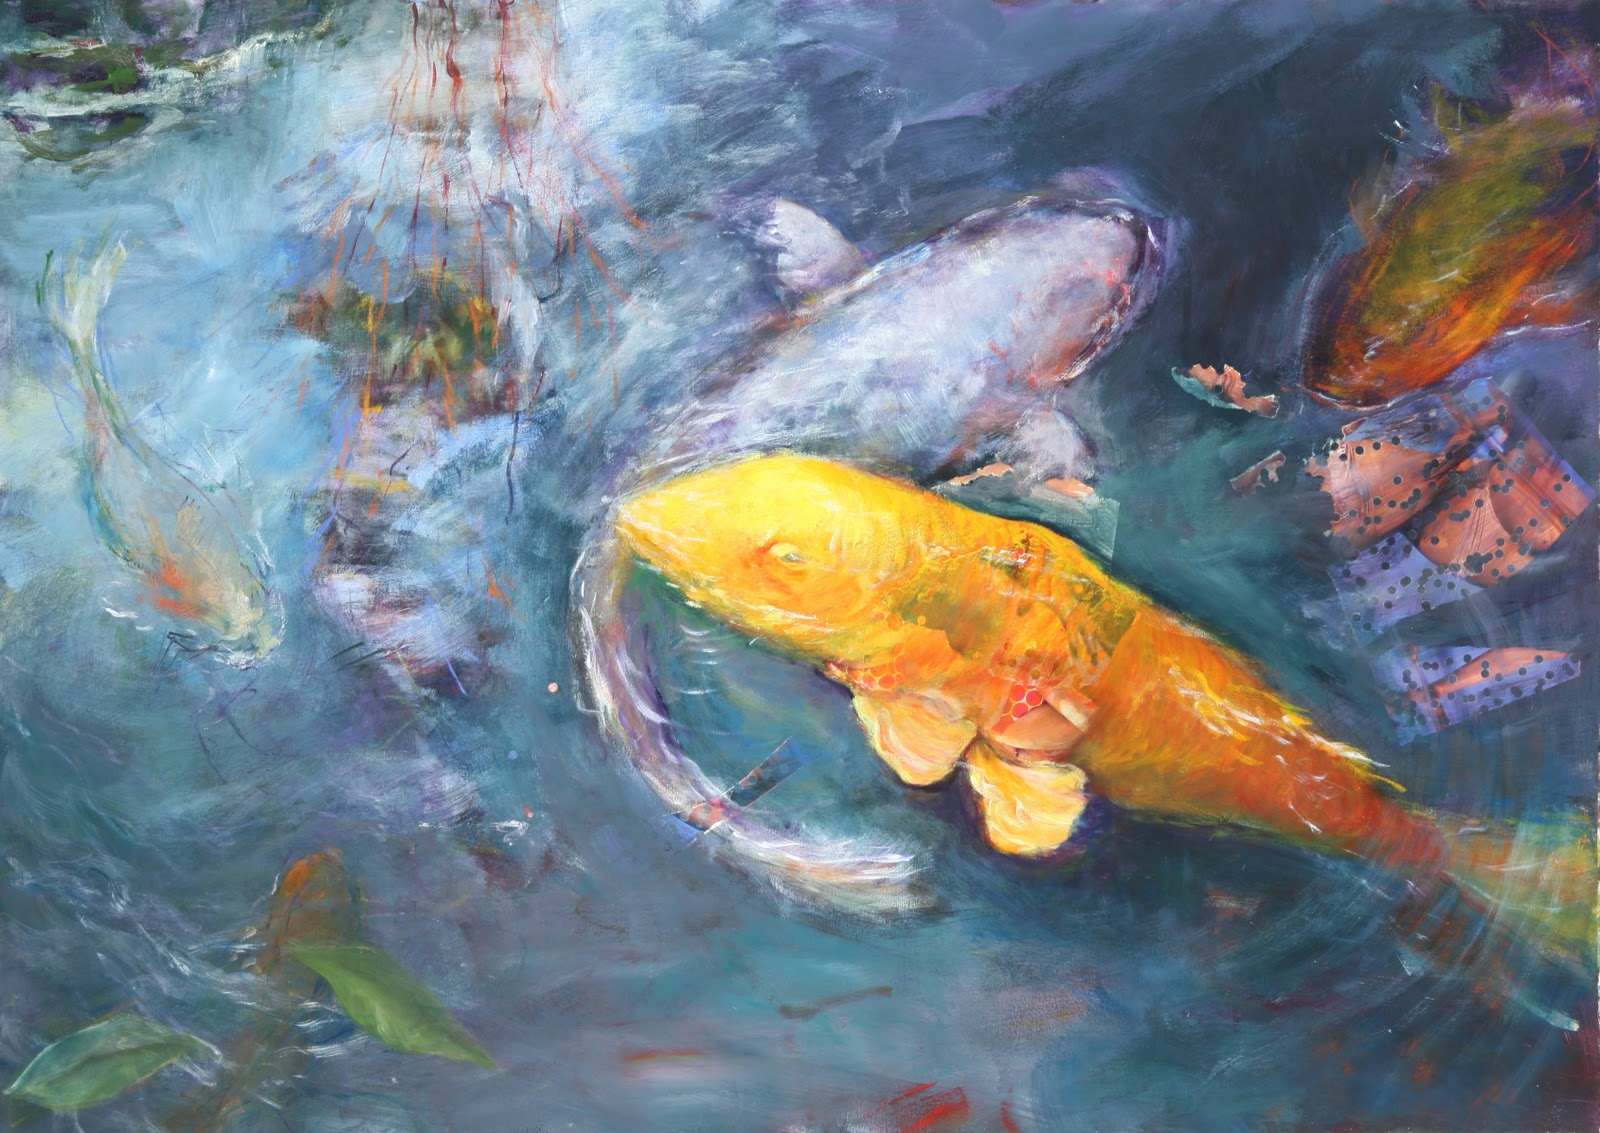 Nanci hersh artist big fish little pond for Big fish in a small pond